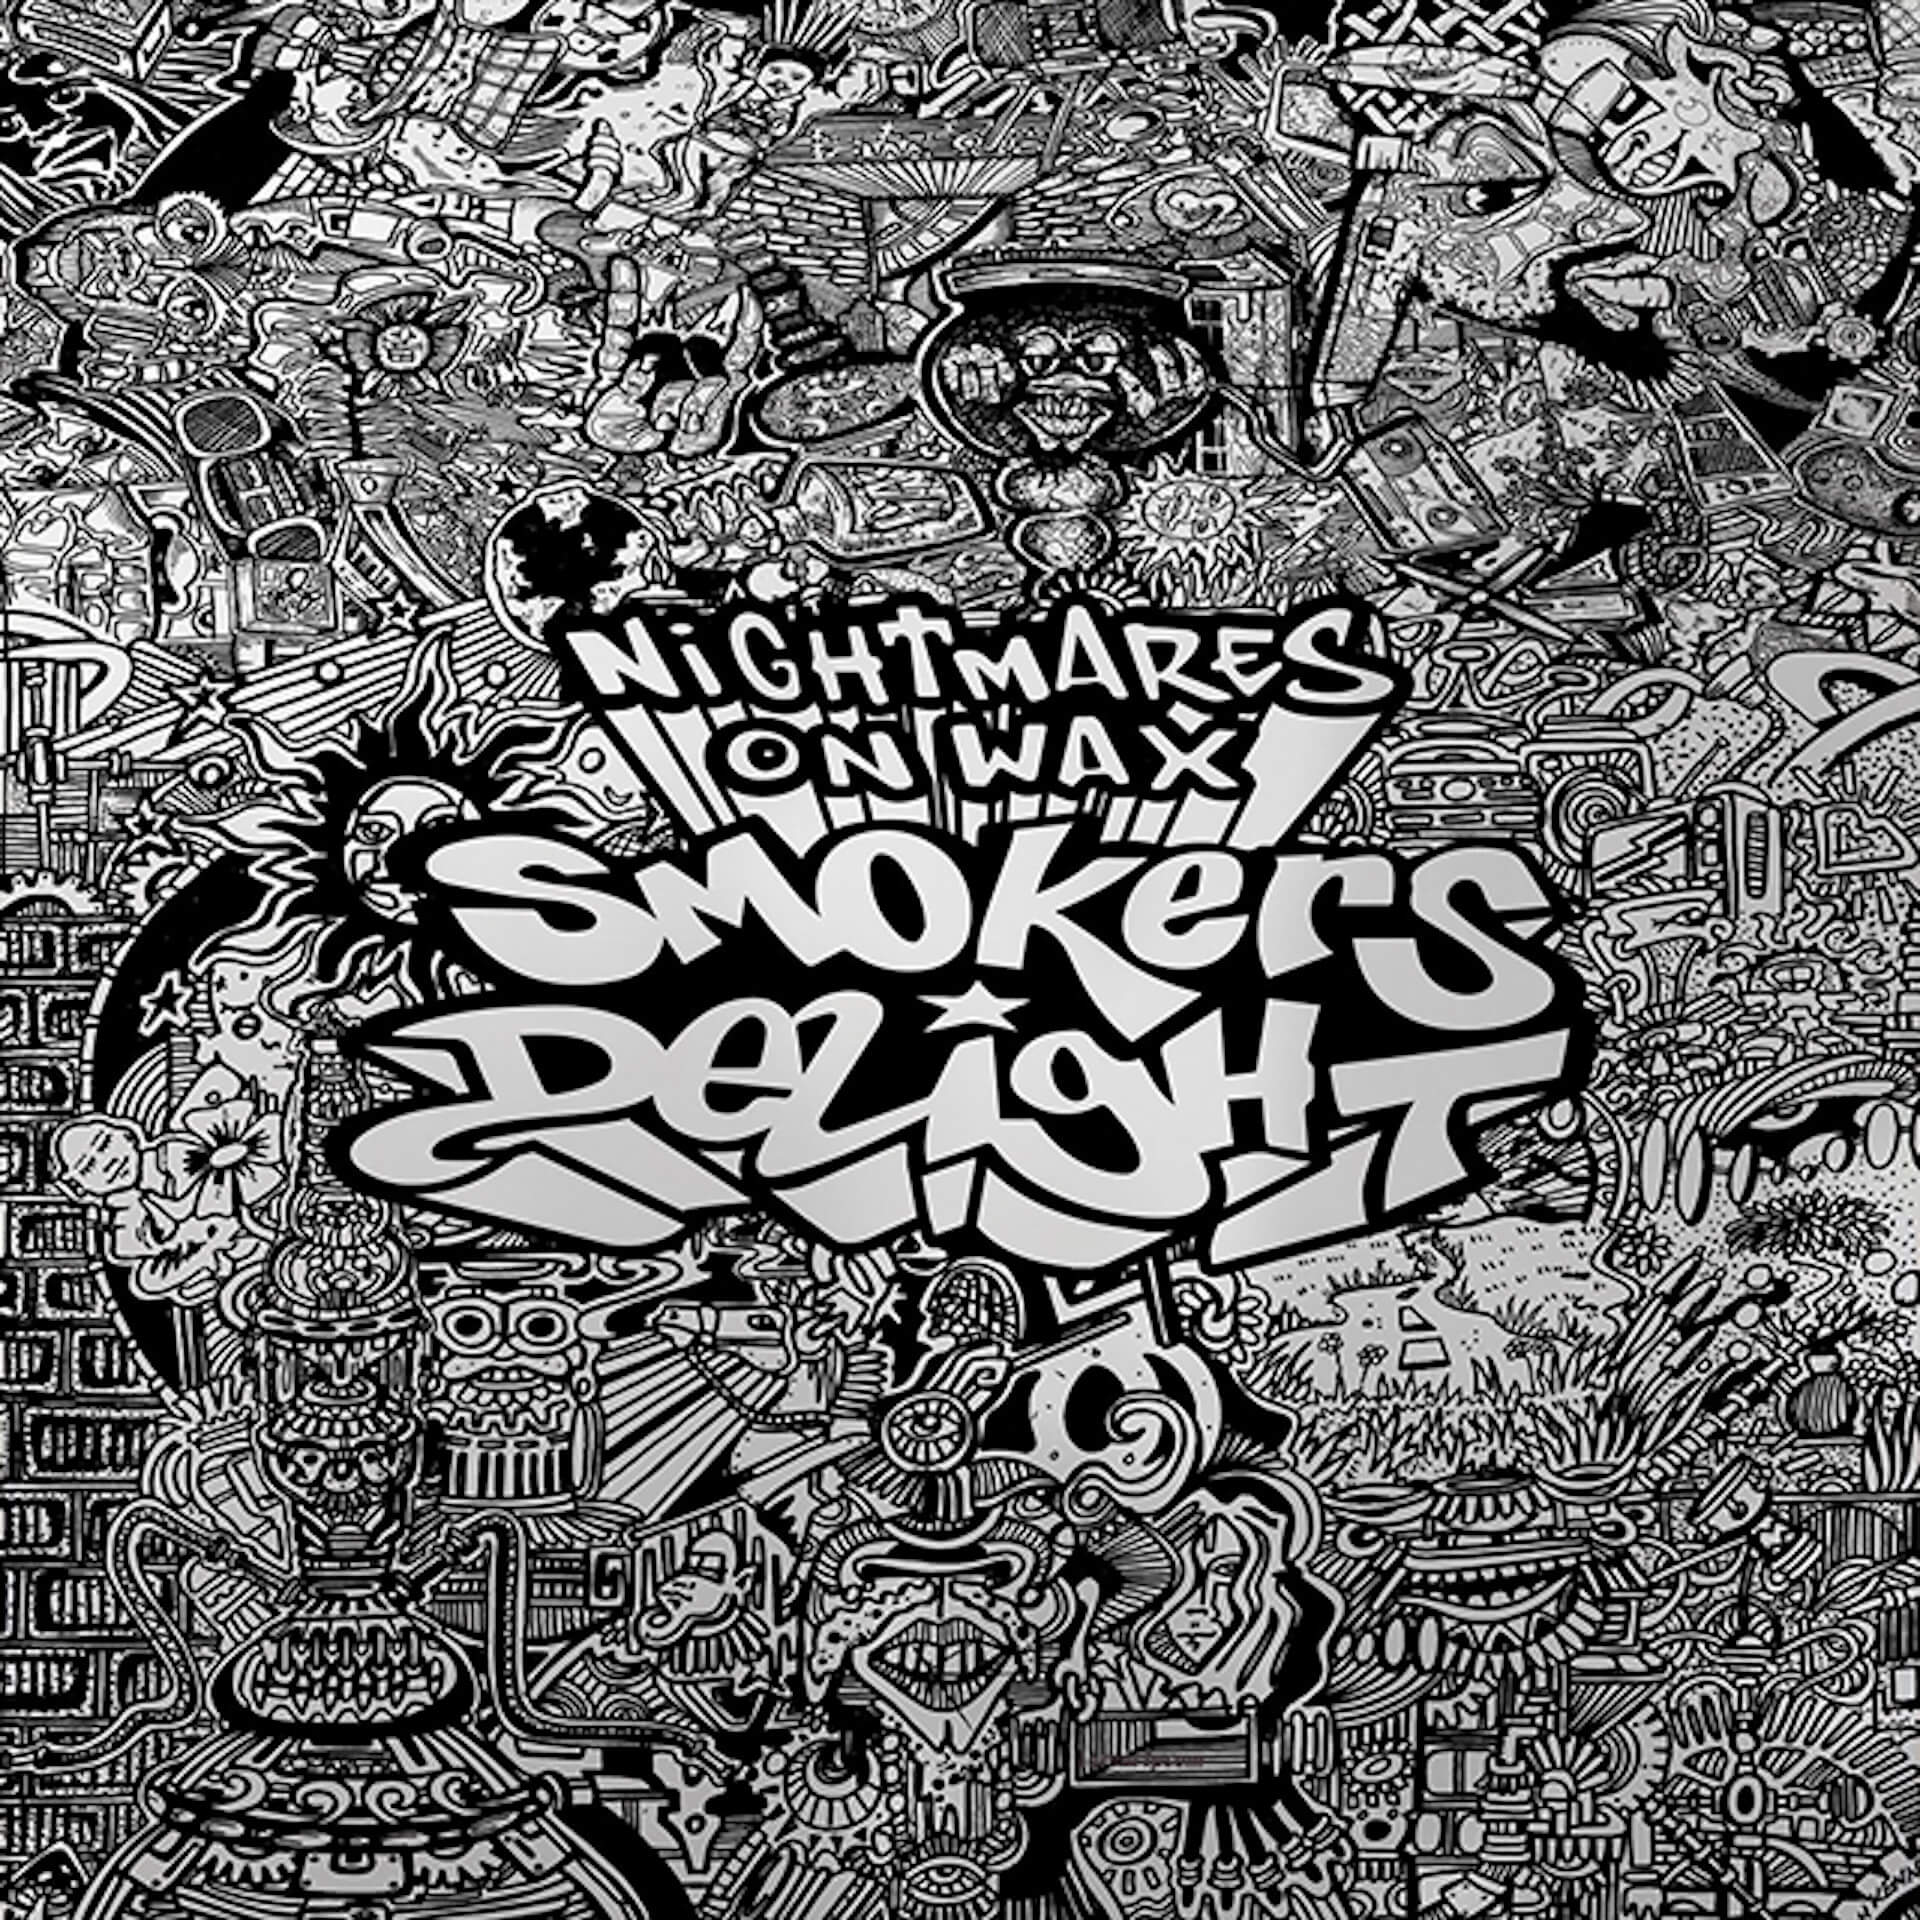 Nightmares On Wax本人が見た夢にインスパイアされたショートフィルムが公開!歴史的名盤に新曲を追加した12インチ『Smokers Delight: Sonic Buds』が本日リリース music201016_nightmaresonwax_2